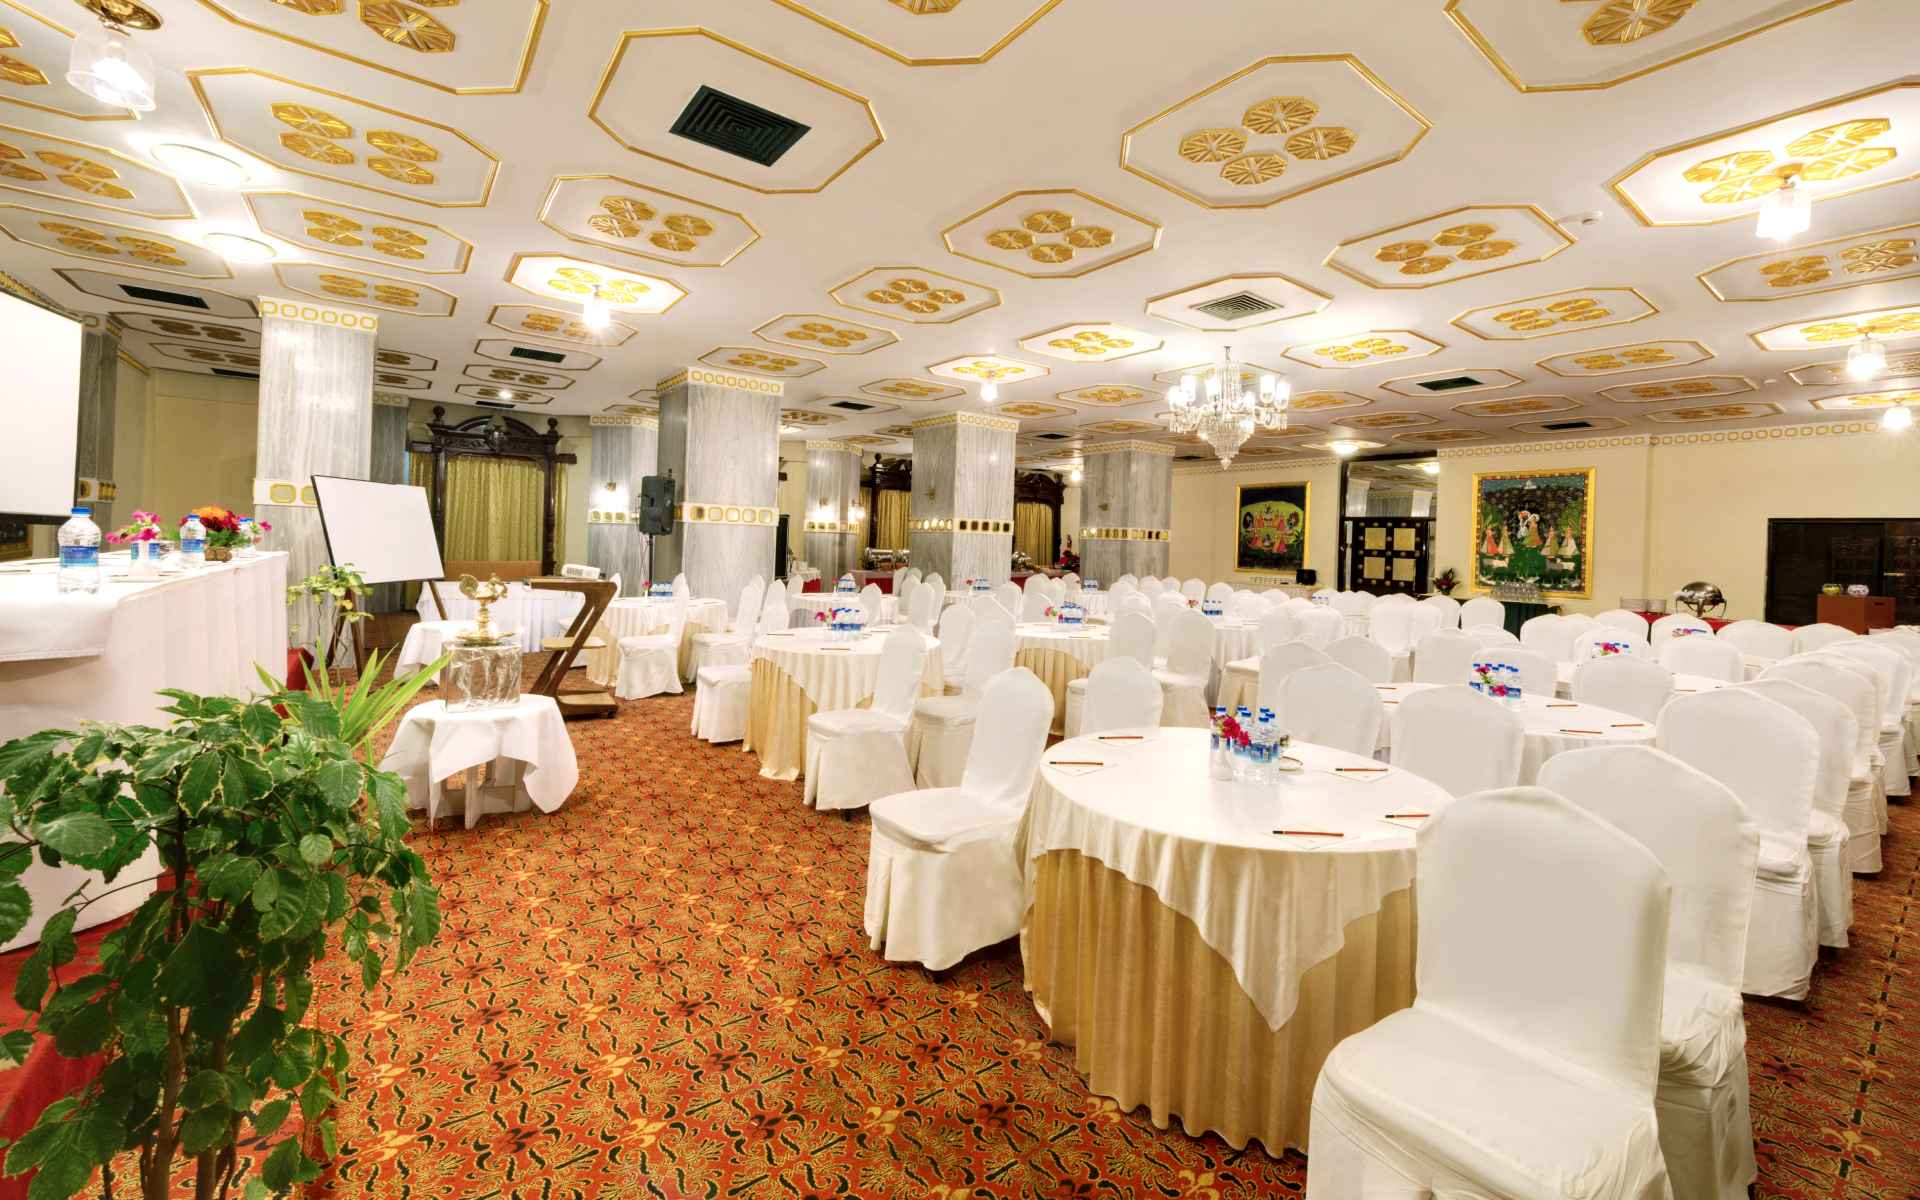 Banquet ambassador ajanta aurangabad - The Ambassador   Heritage Hotels in Mumbai, Aurangabad, Chennai - Meetings & Events